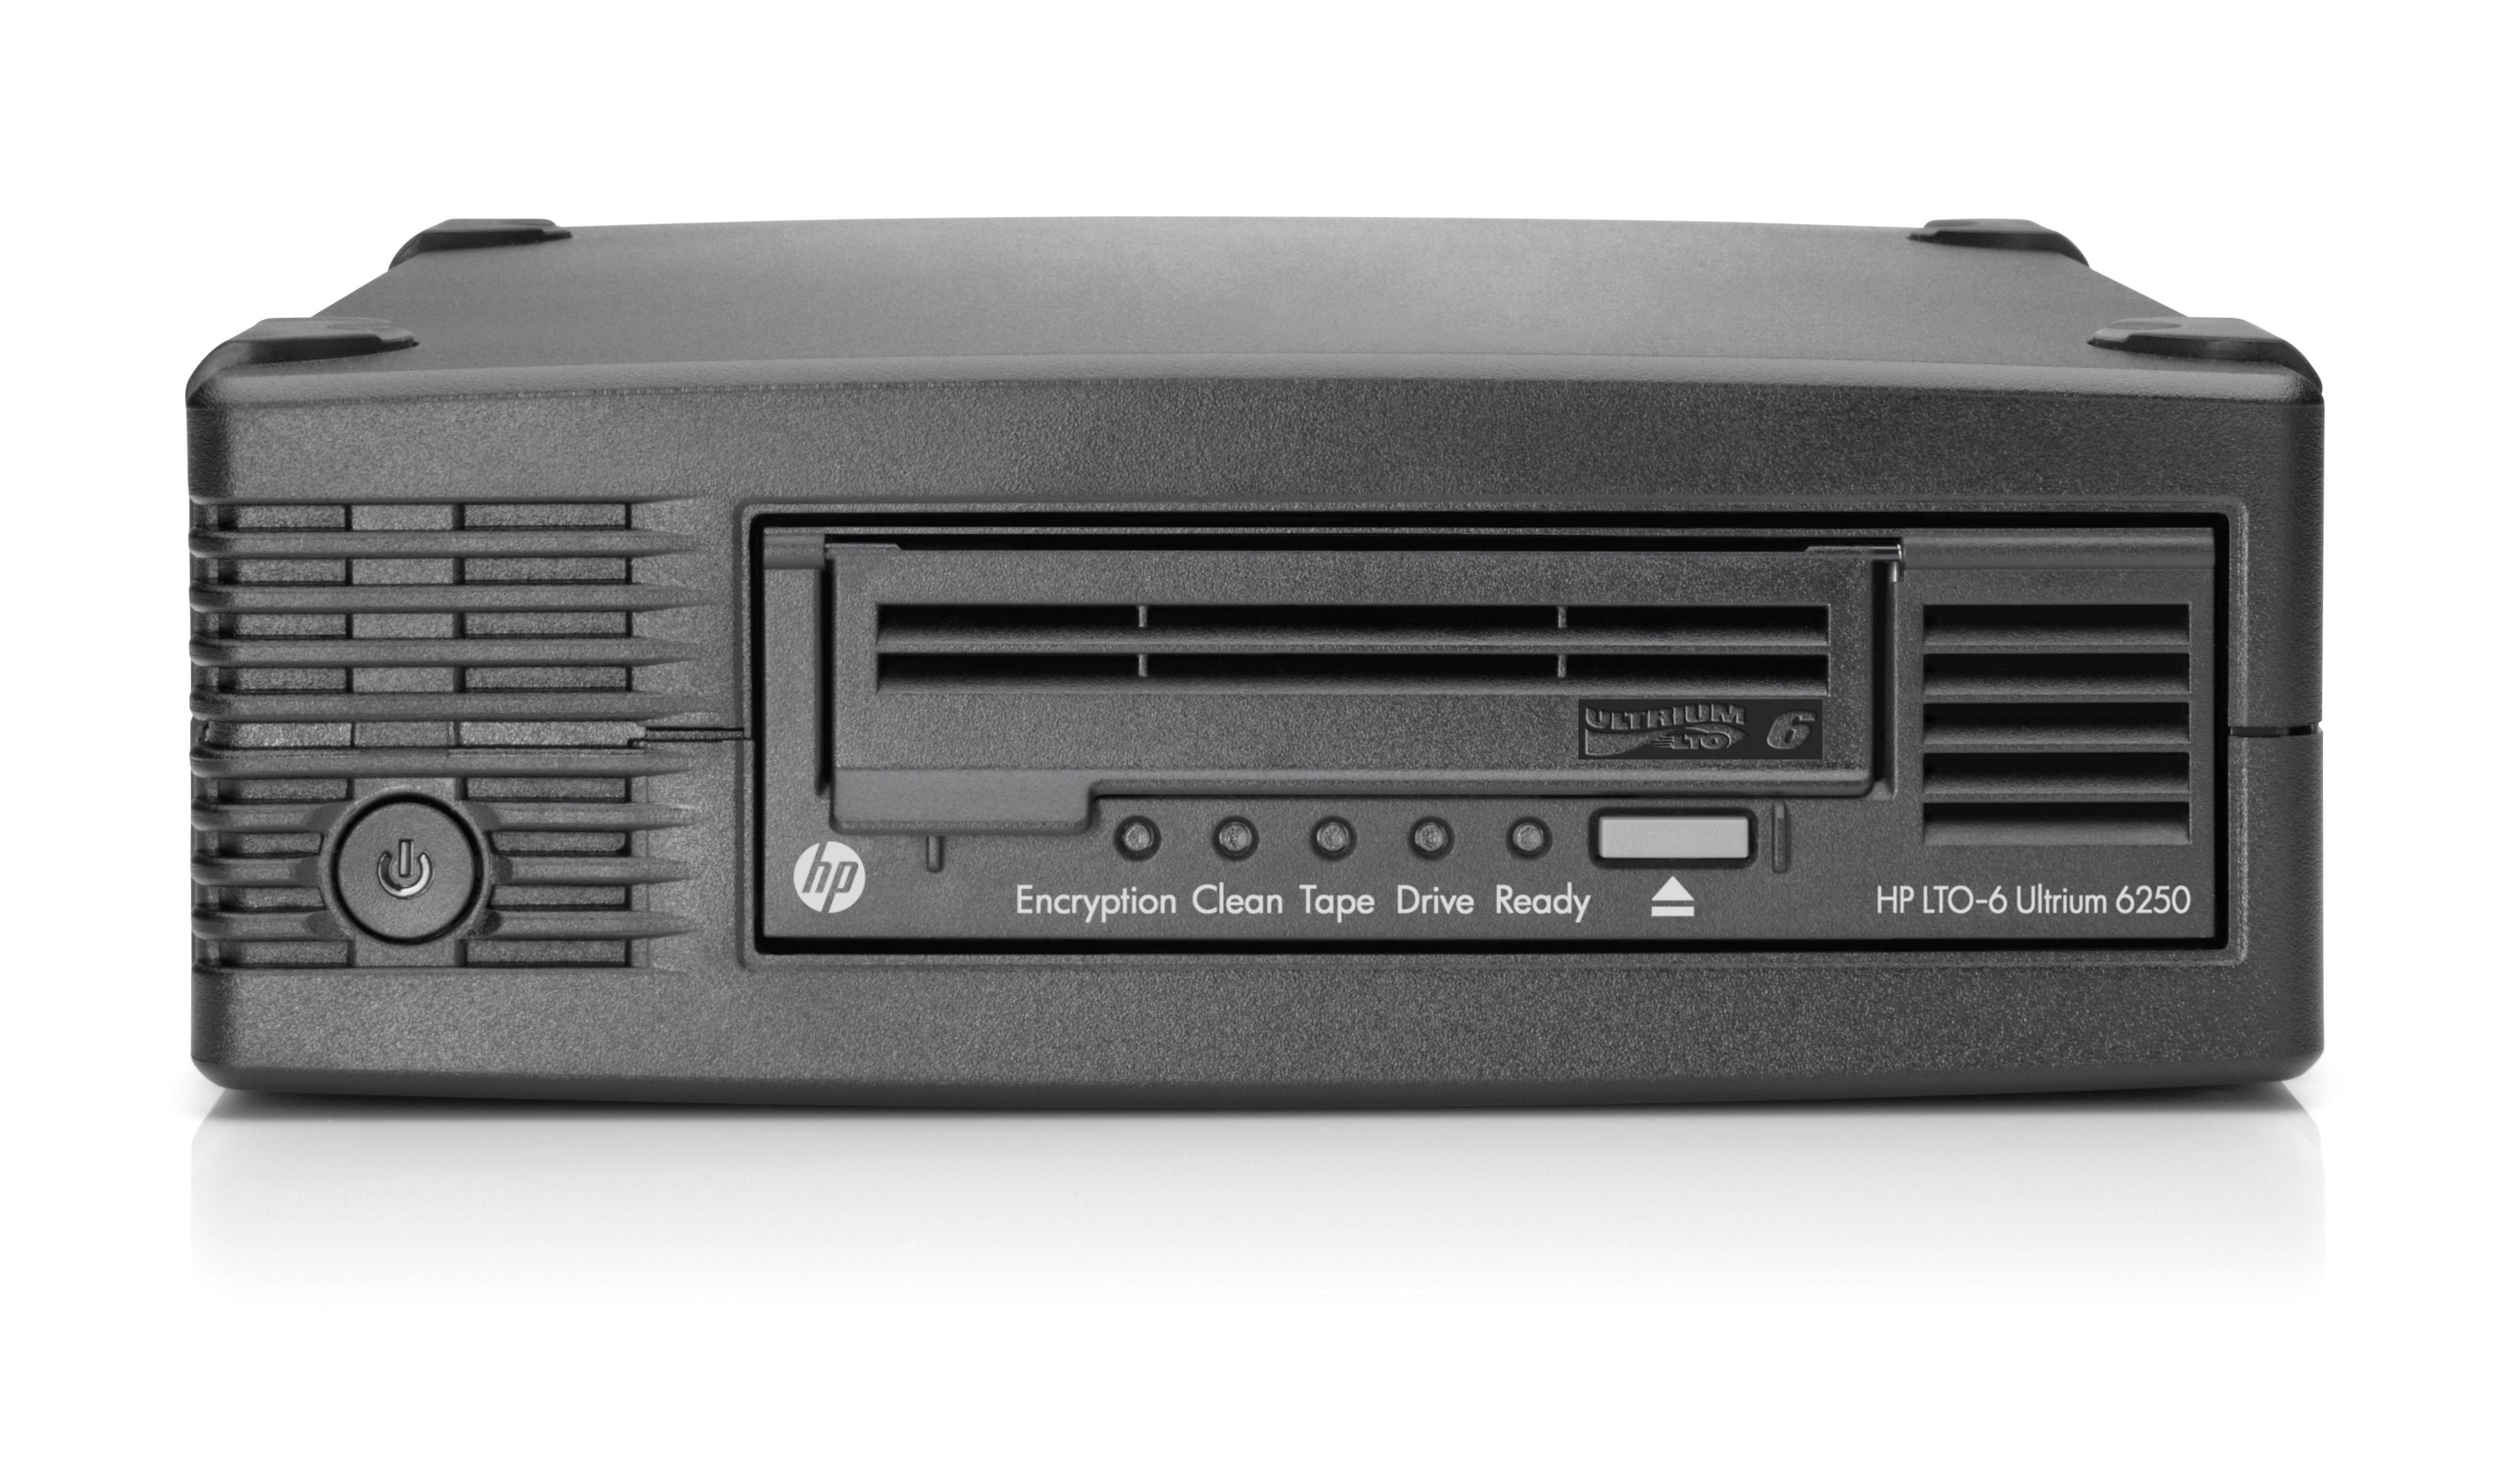 HP StoreEver LTO-6 Ultrium 6250 Tape Drive (External)